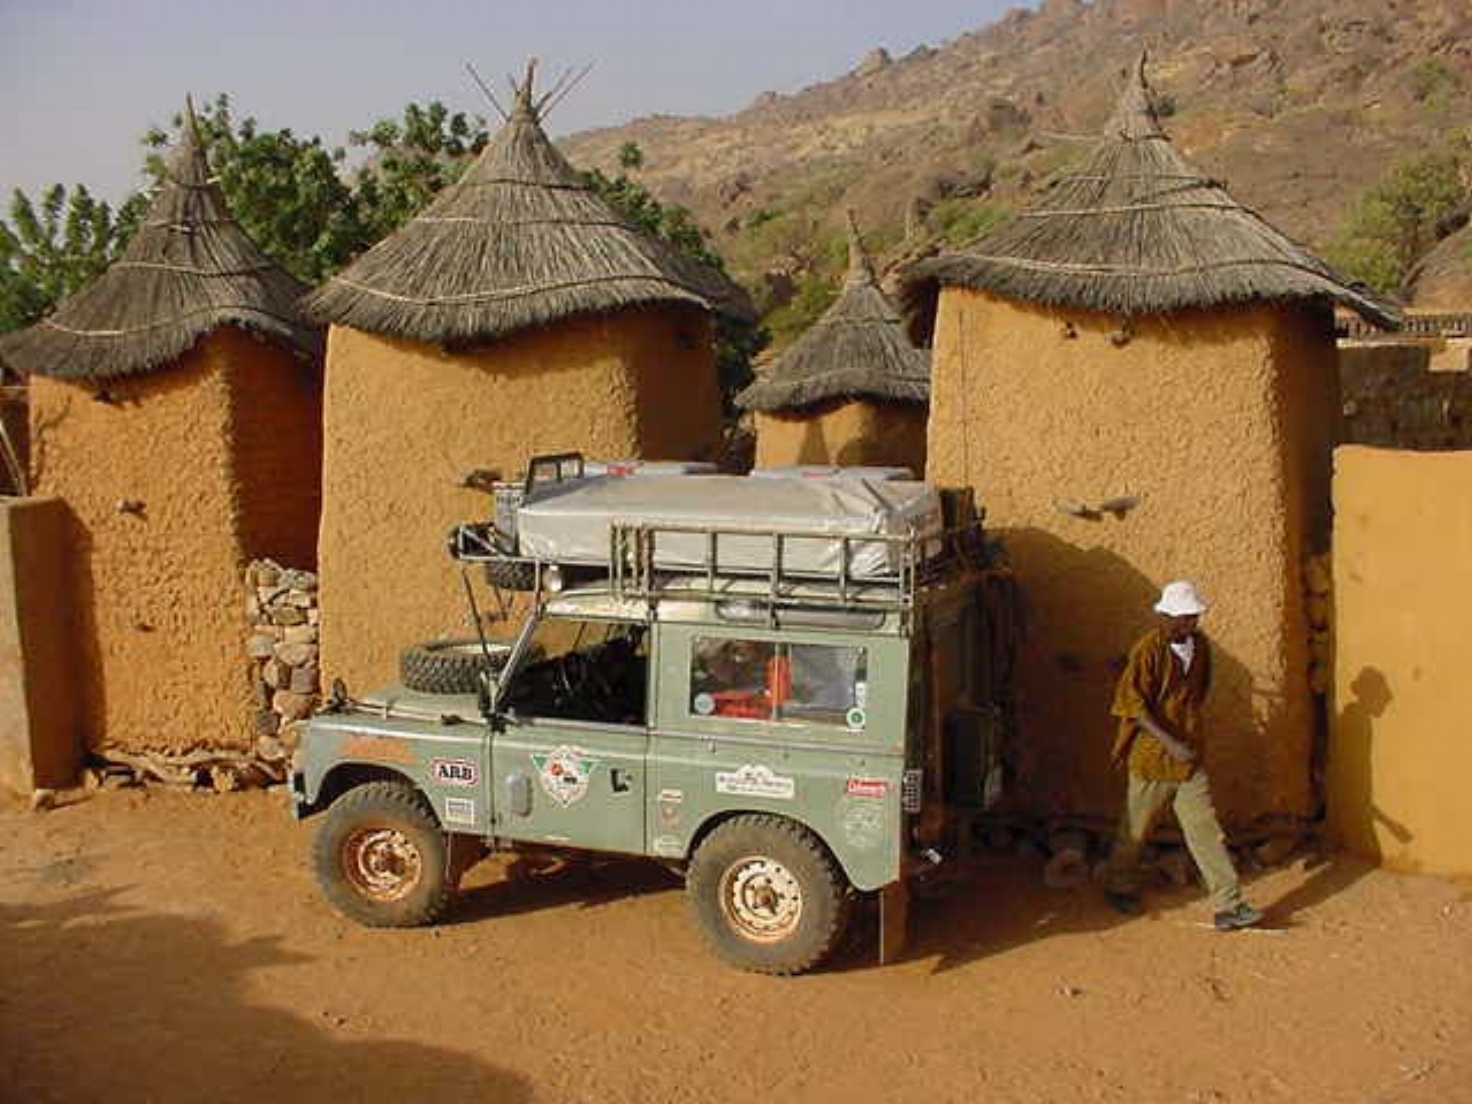 Michael Ladden's Land Rover in Dogon Mali